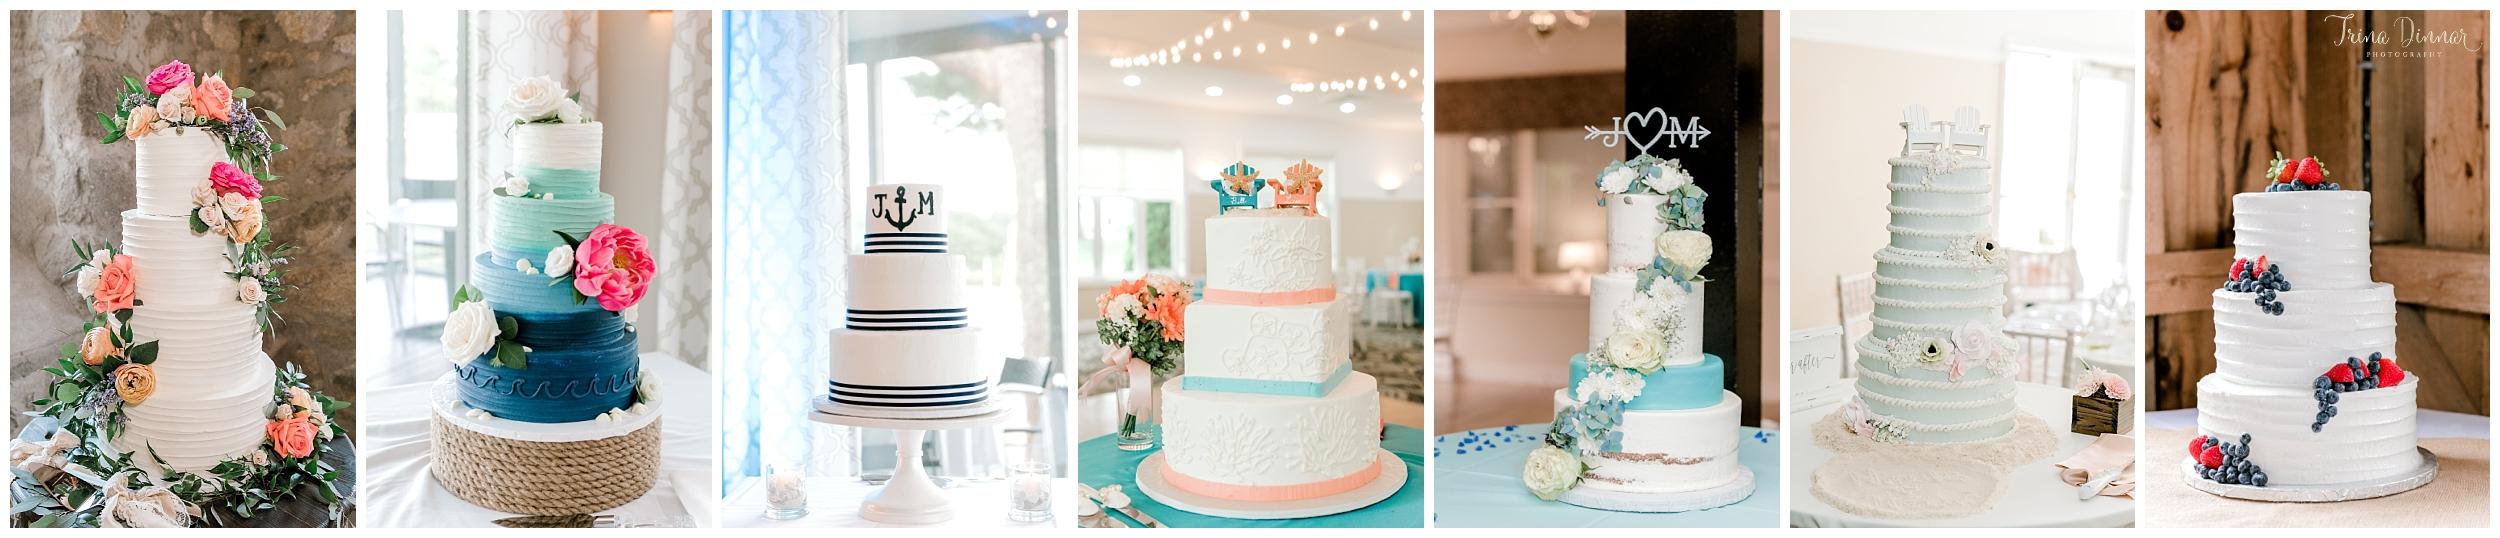 Favorite Maine Wedding Cakes of 2018